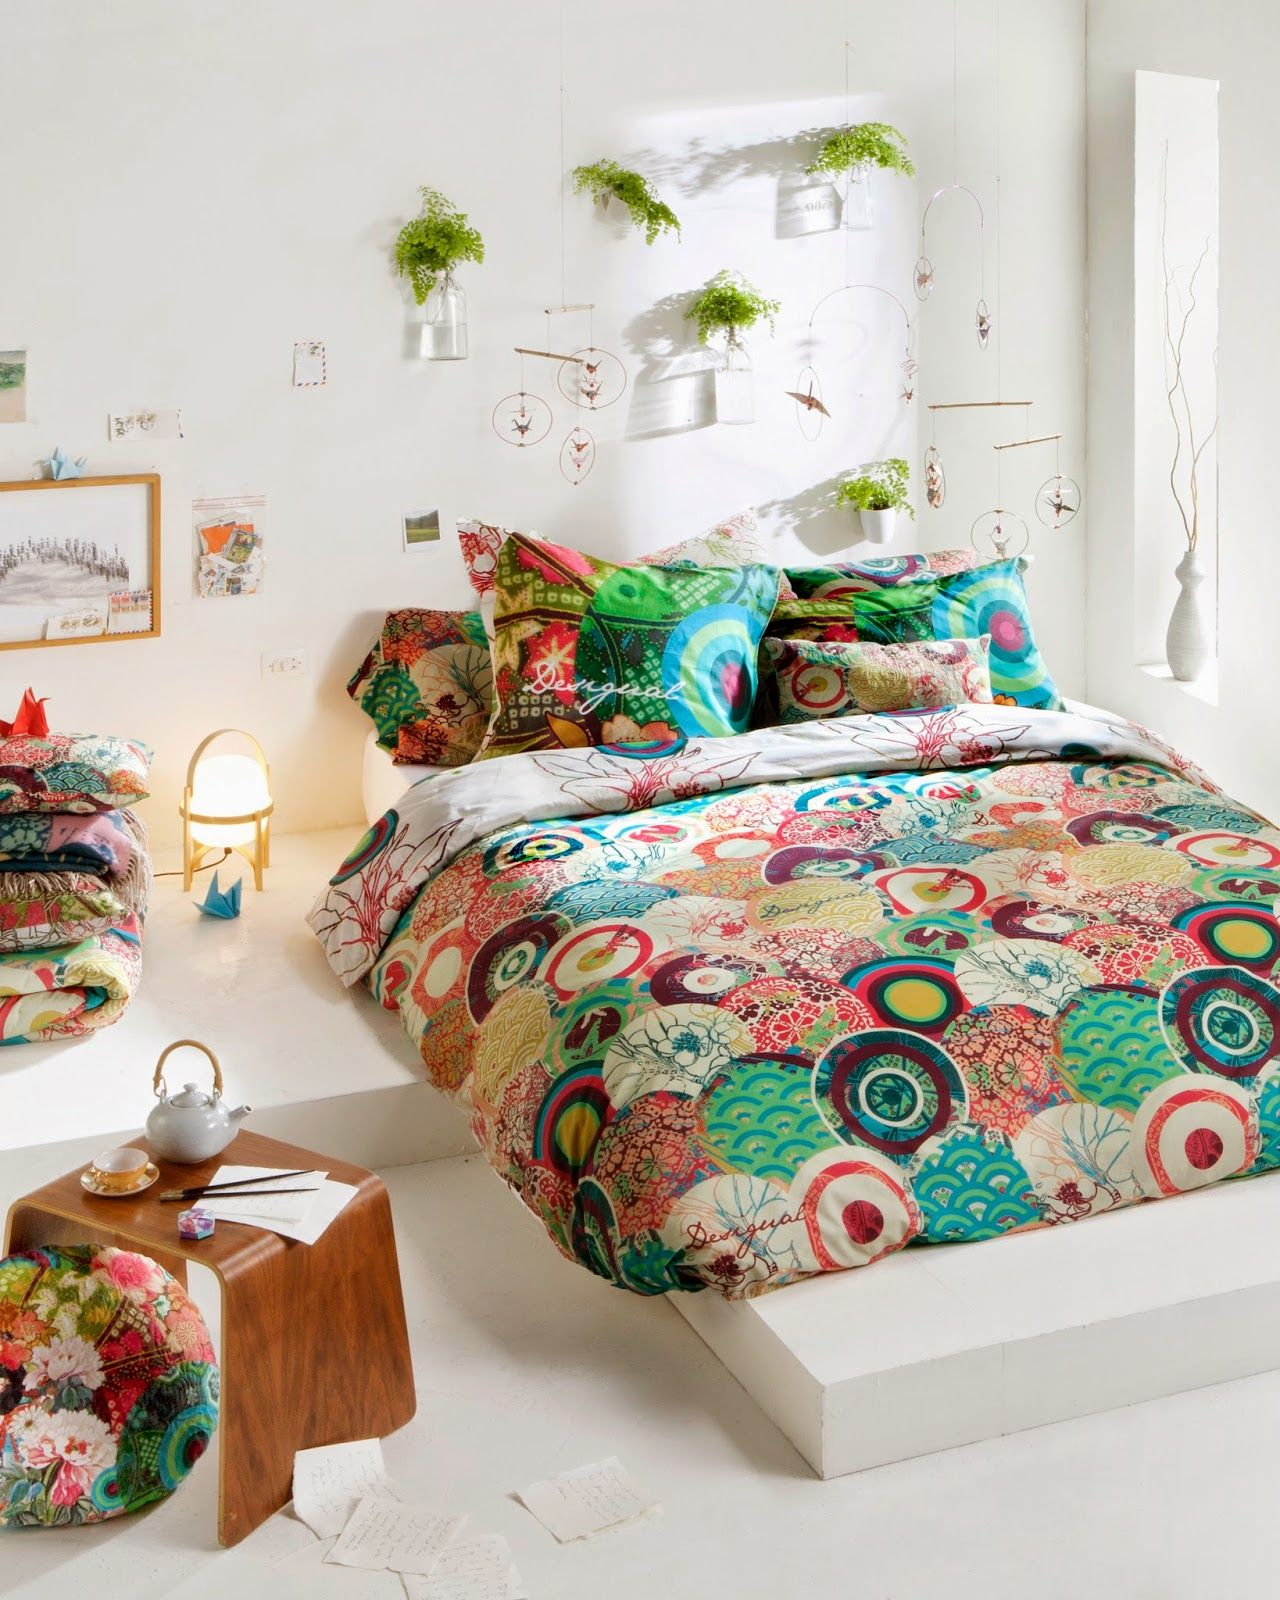 Rooms desigual living desigual pinterest home - Desigual home decor ...